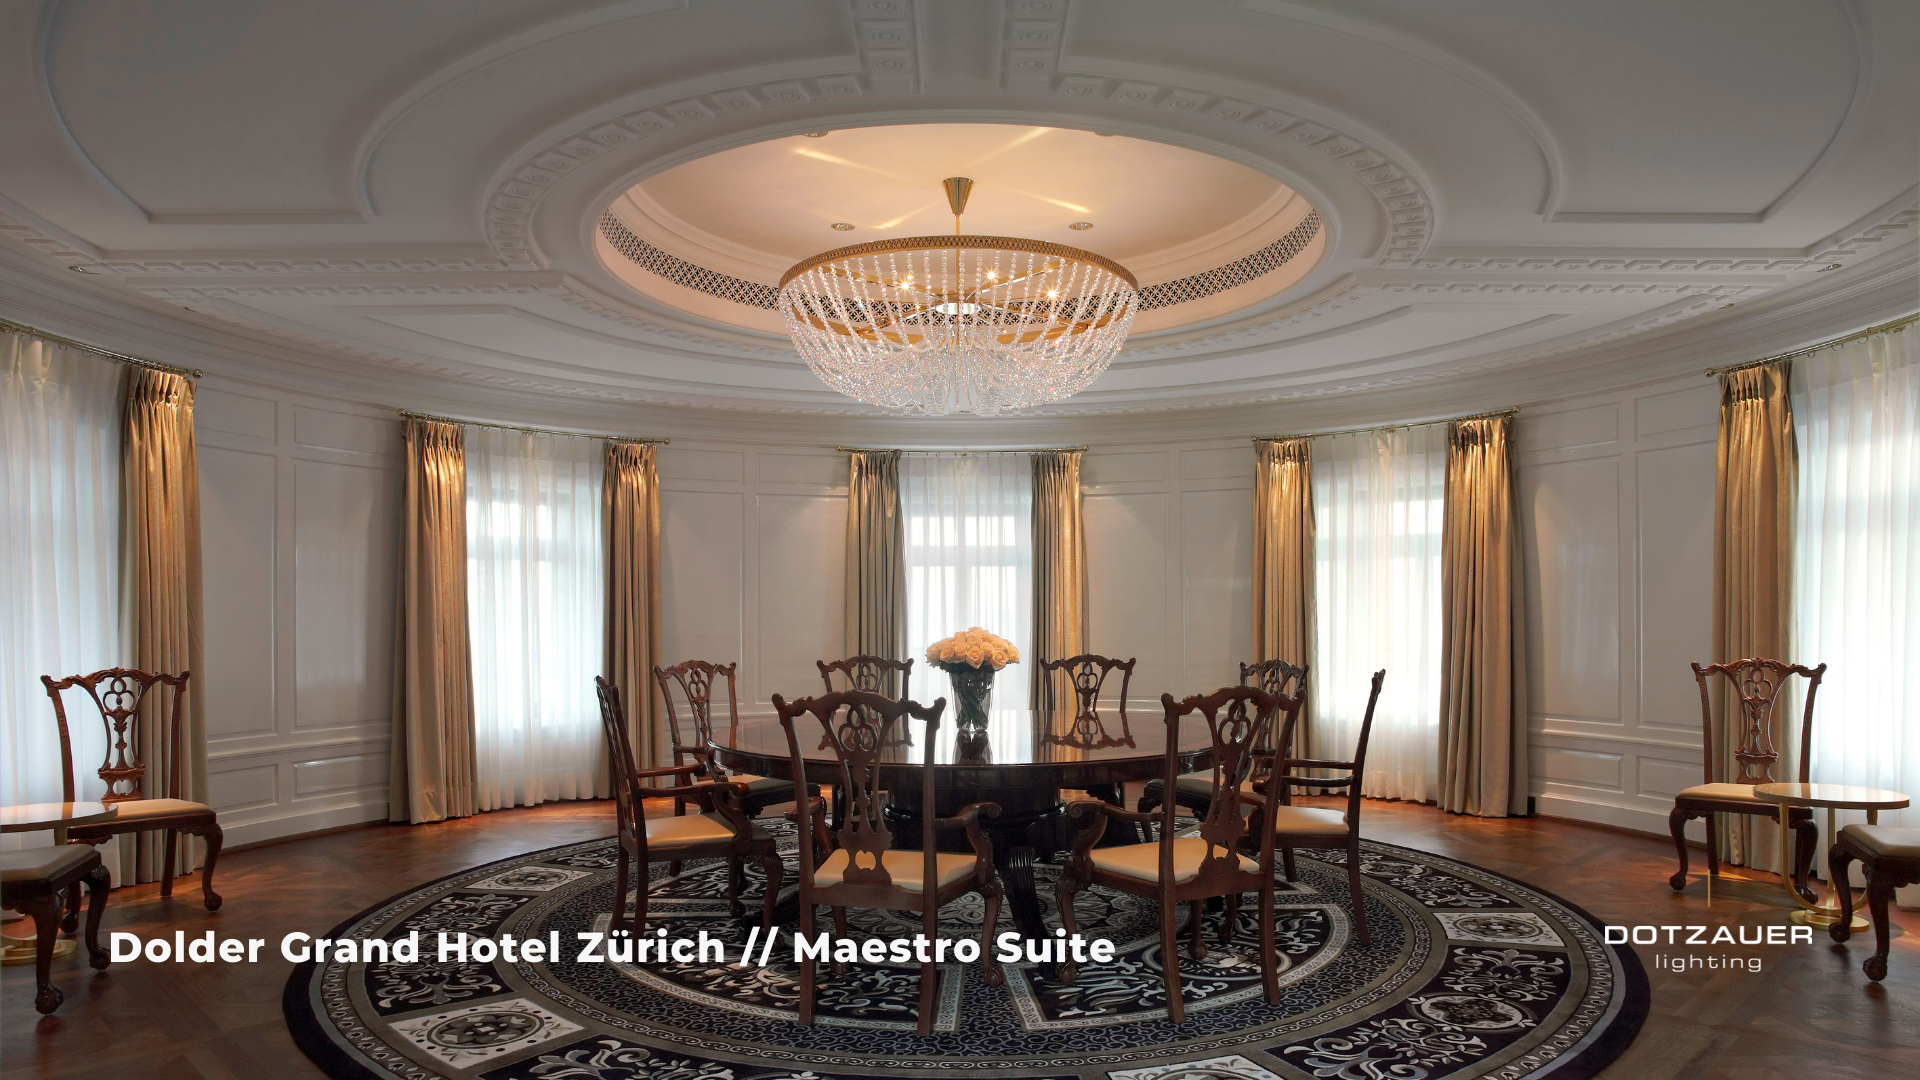 The Dolder Grand Hotel - Maestro Suite